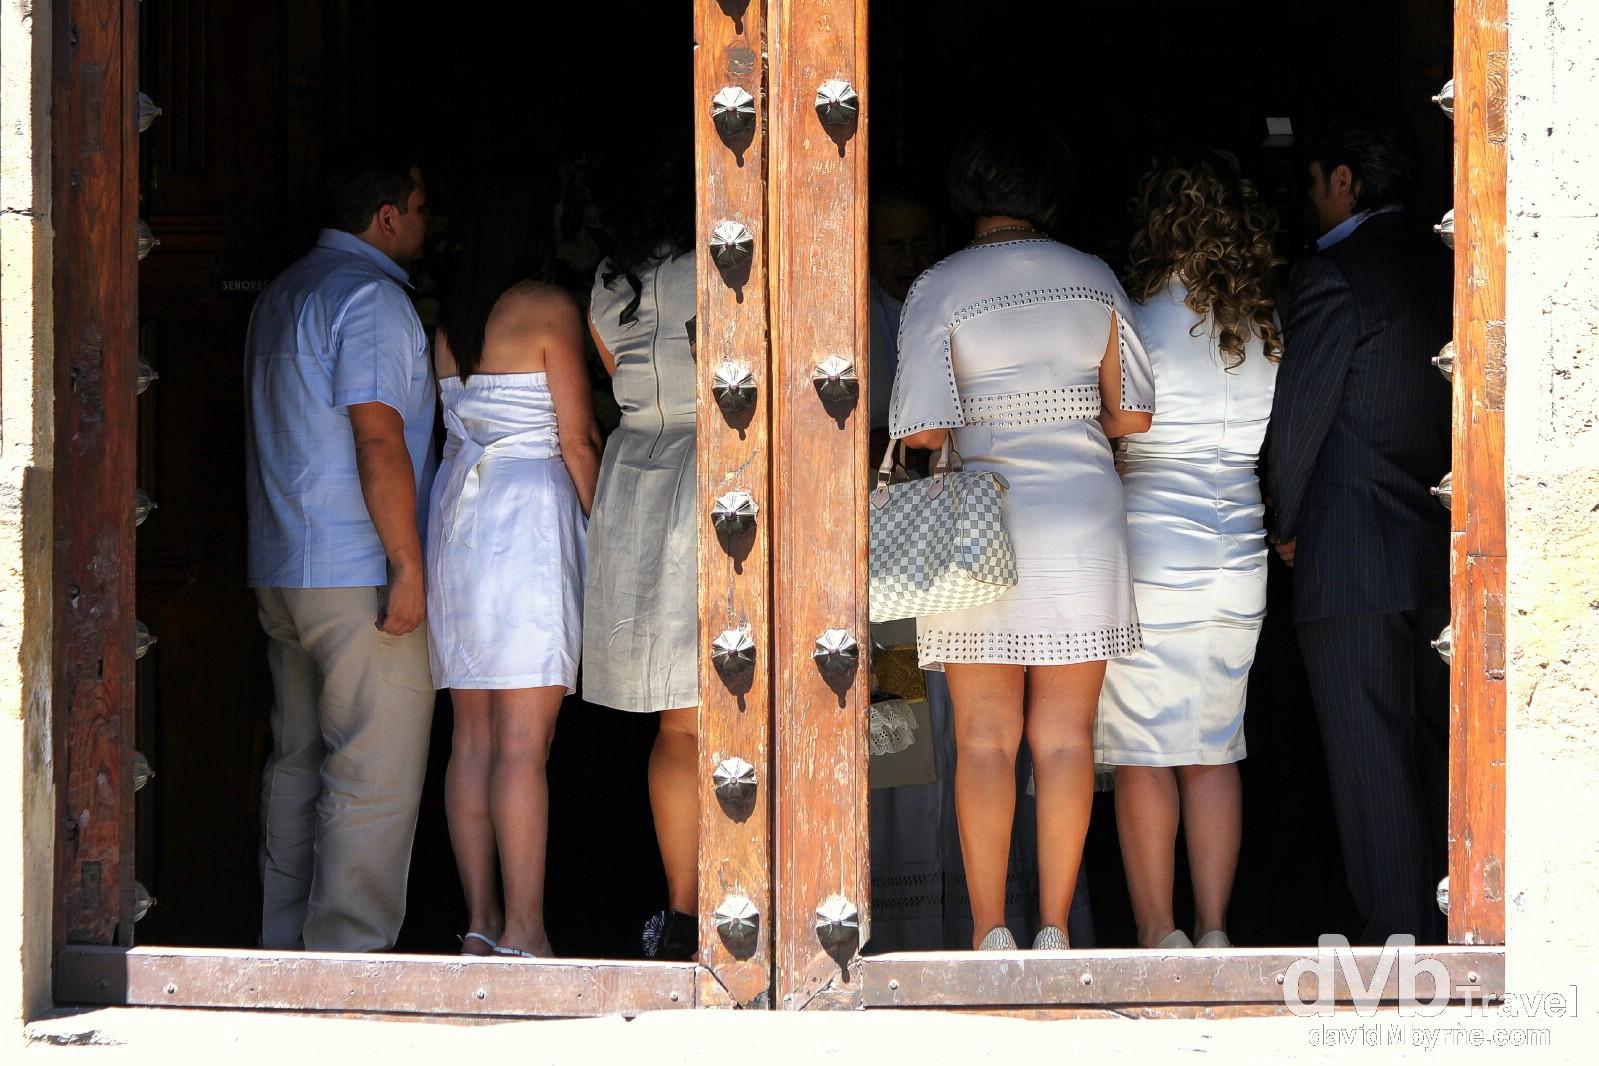 A section of a wedding party inside  Nuestra Senora del Carmen, Guadalajara, Mexico. April 20th 2013.